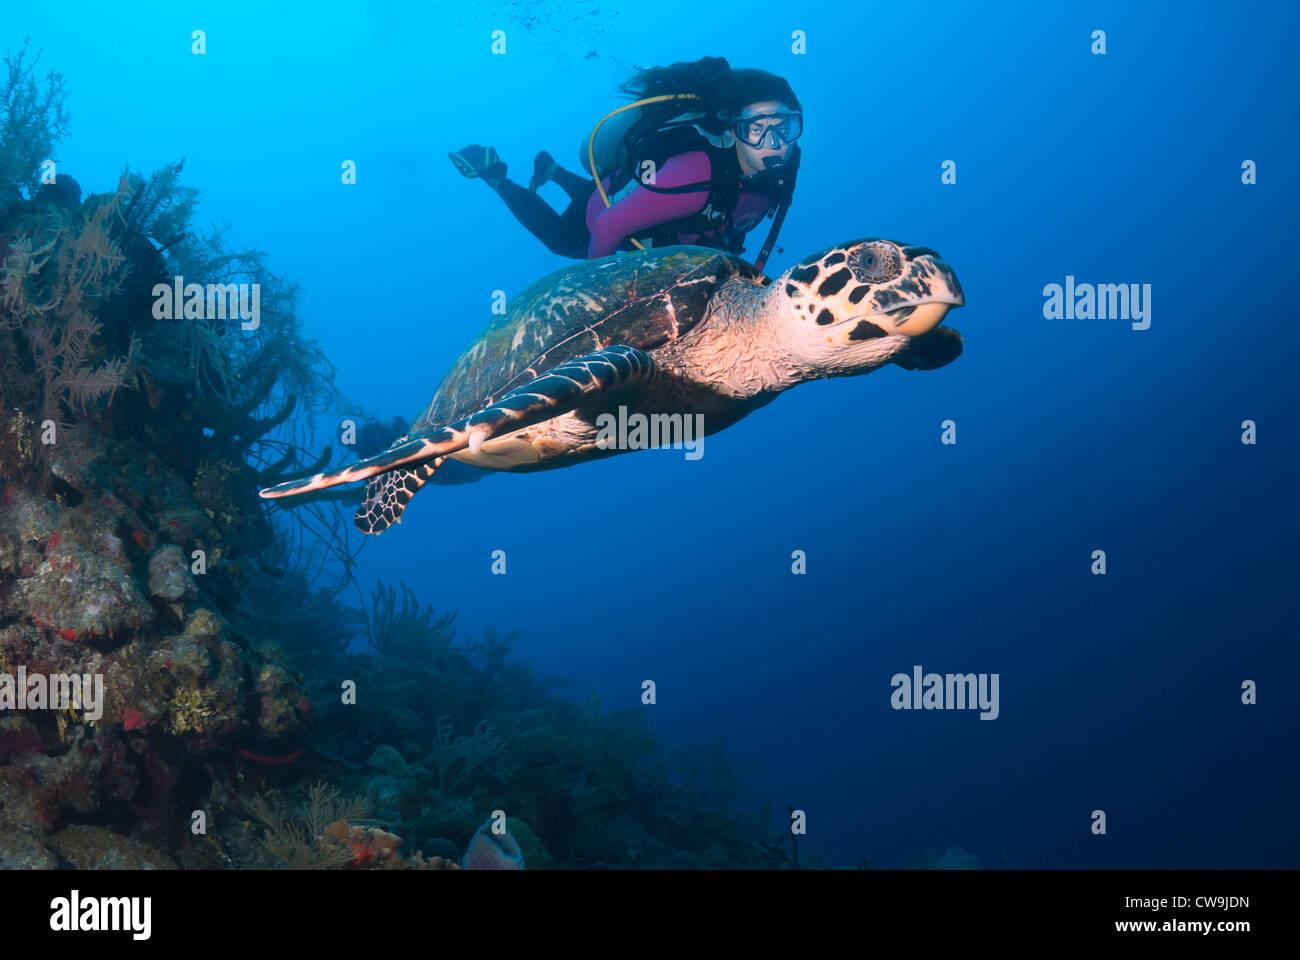 Female Scuba Diver with Hawksbill Turtle Eretmochelys imbricata, Belize, Caribbean Sea, Atlantic Ocean Stock Photo